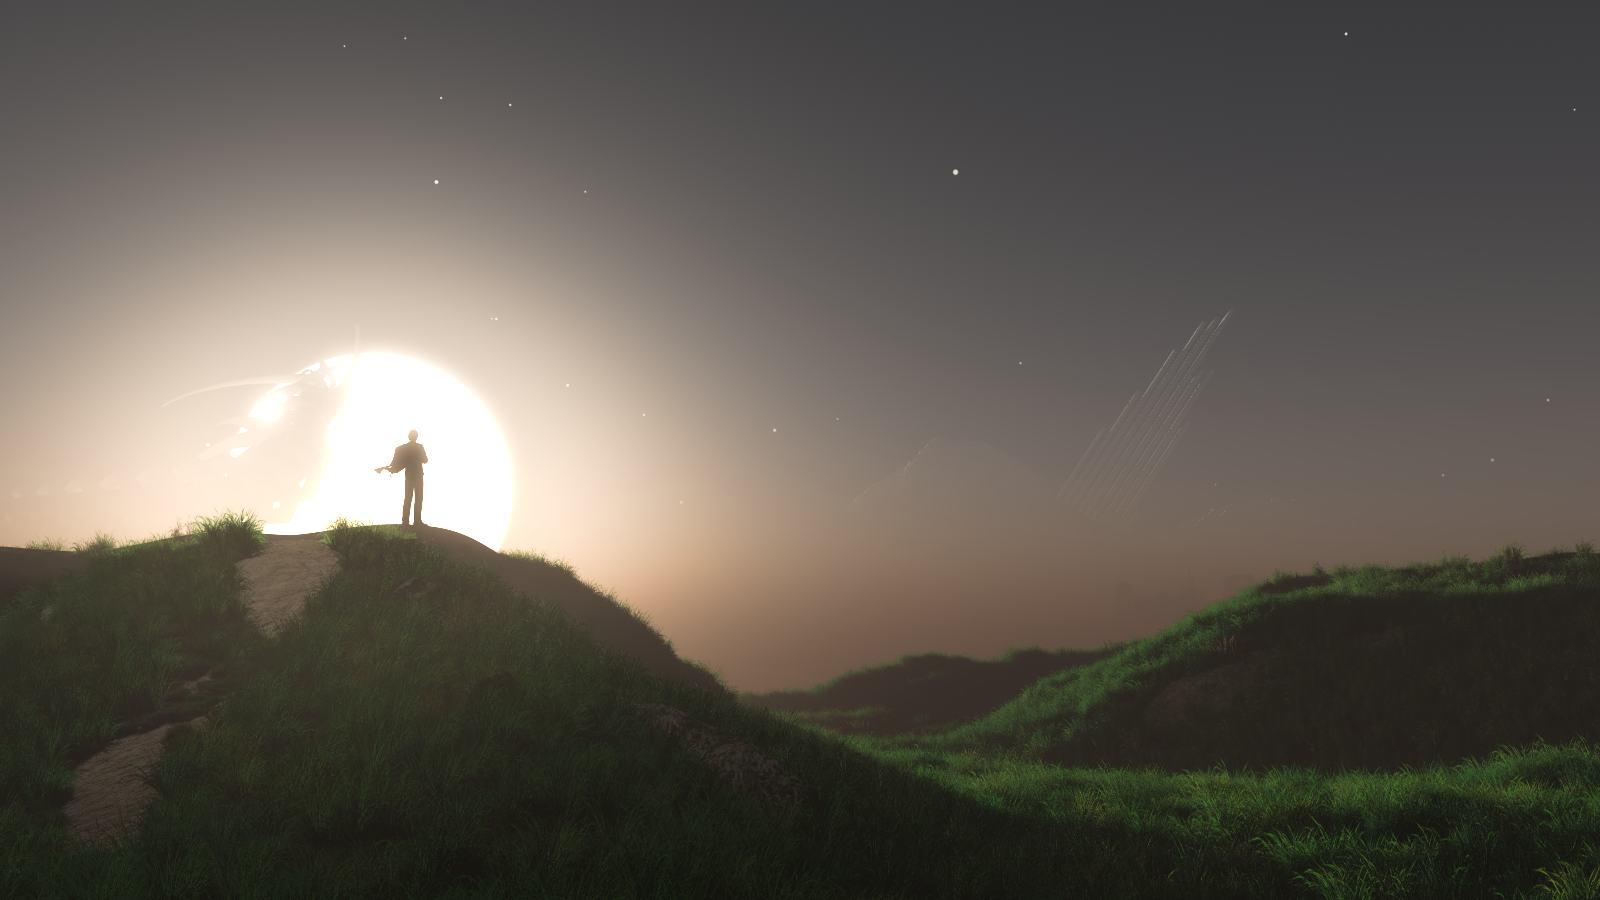 17-colline-night--.jpg